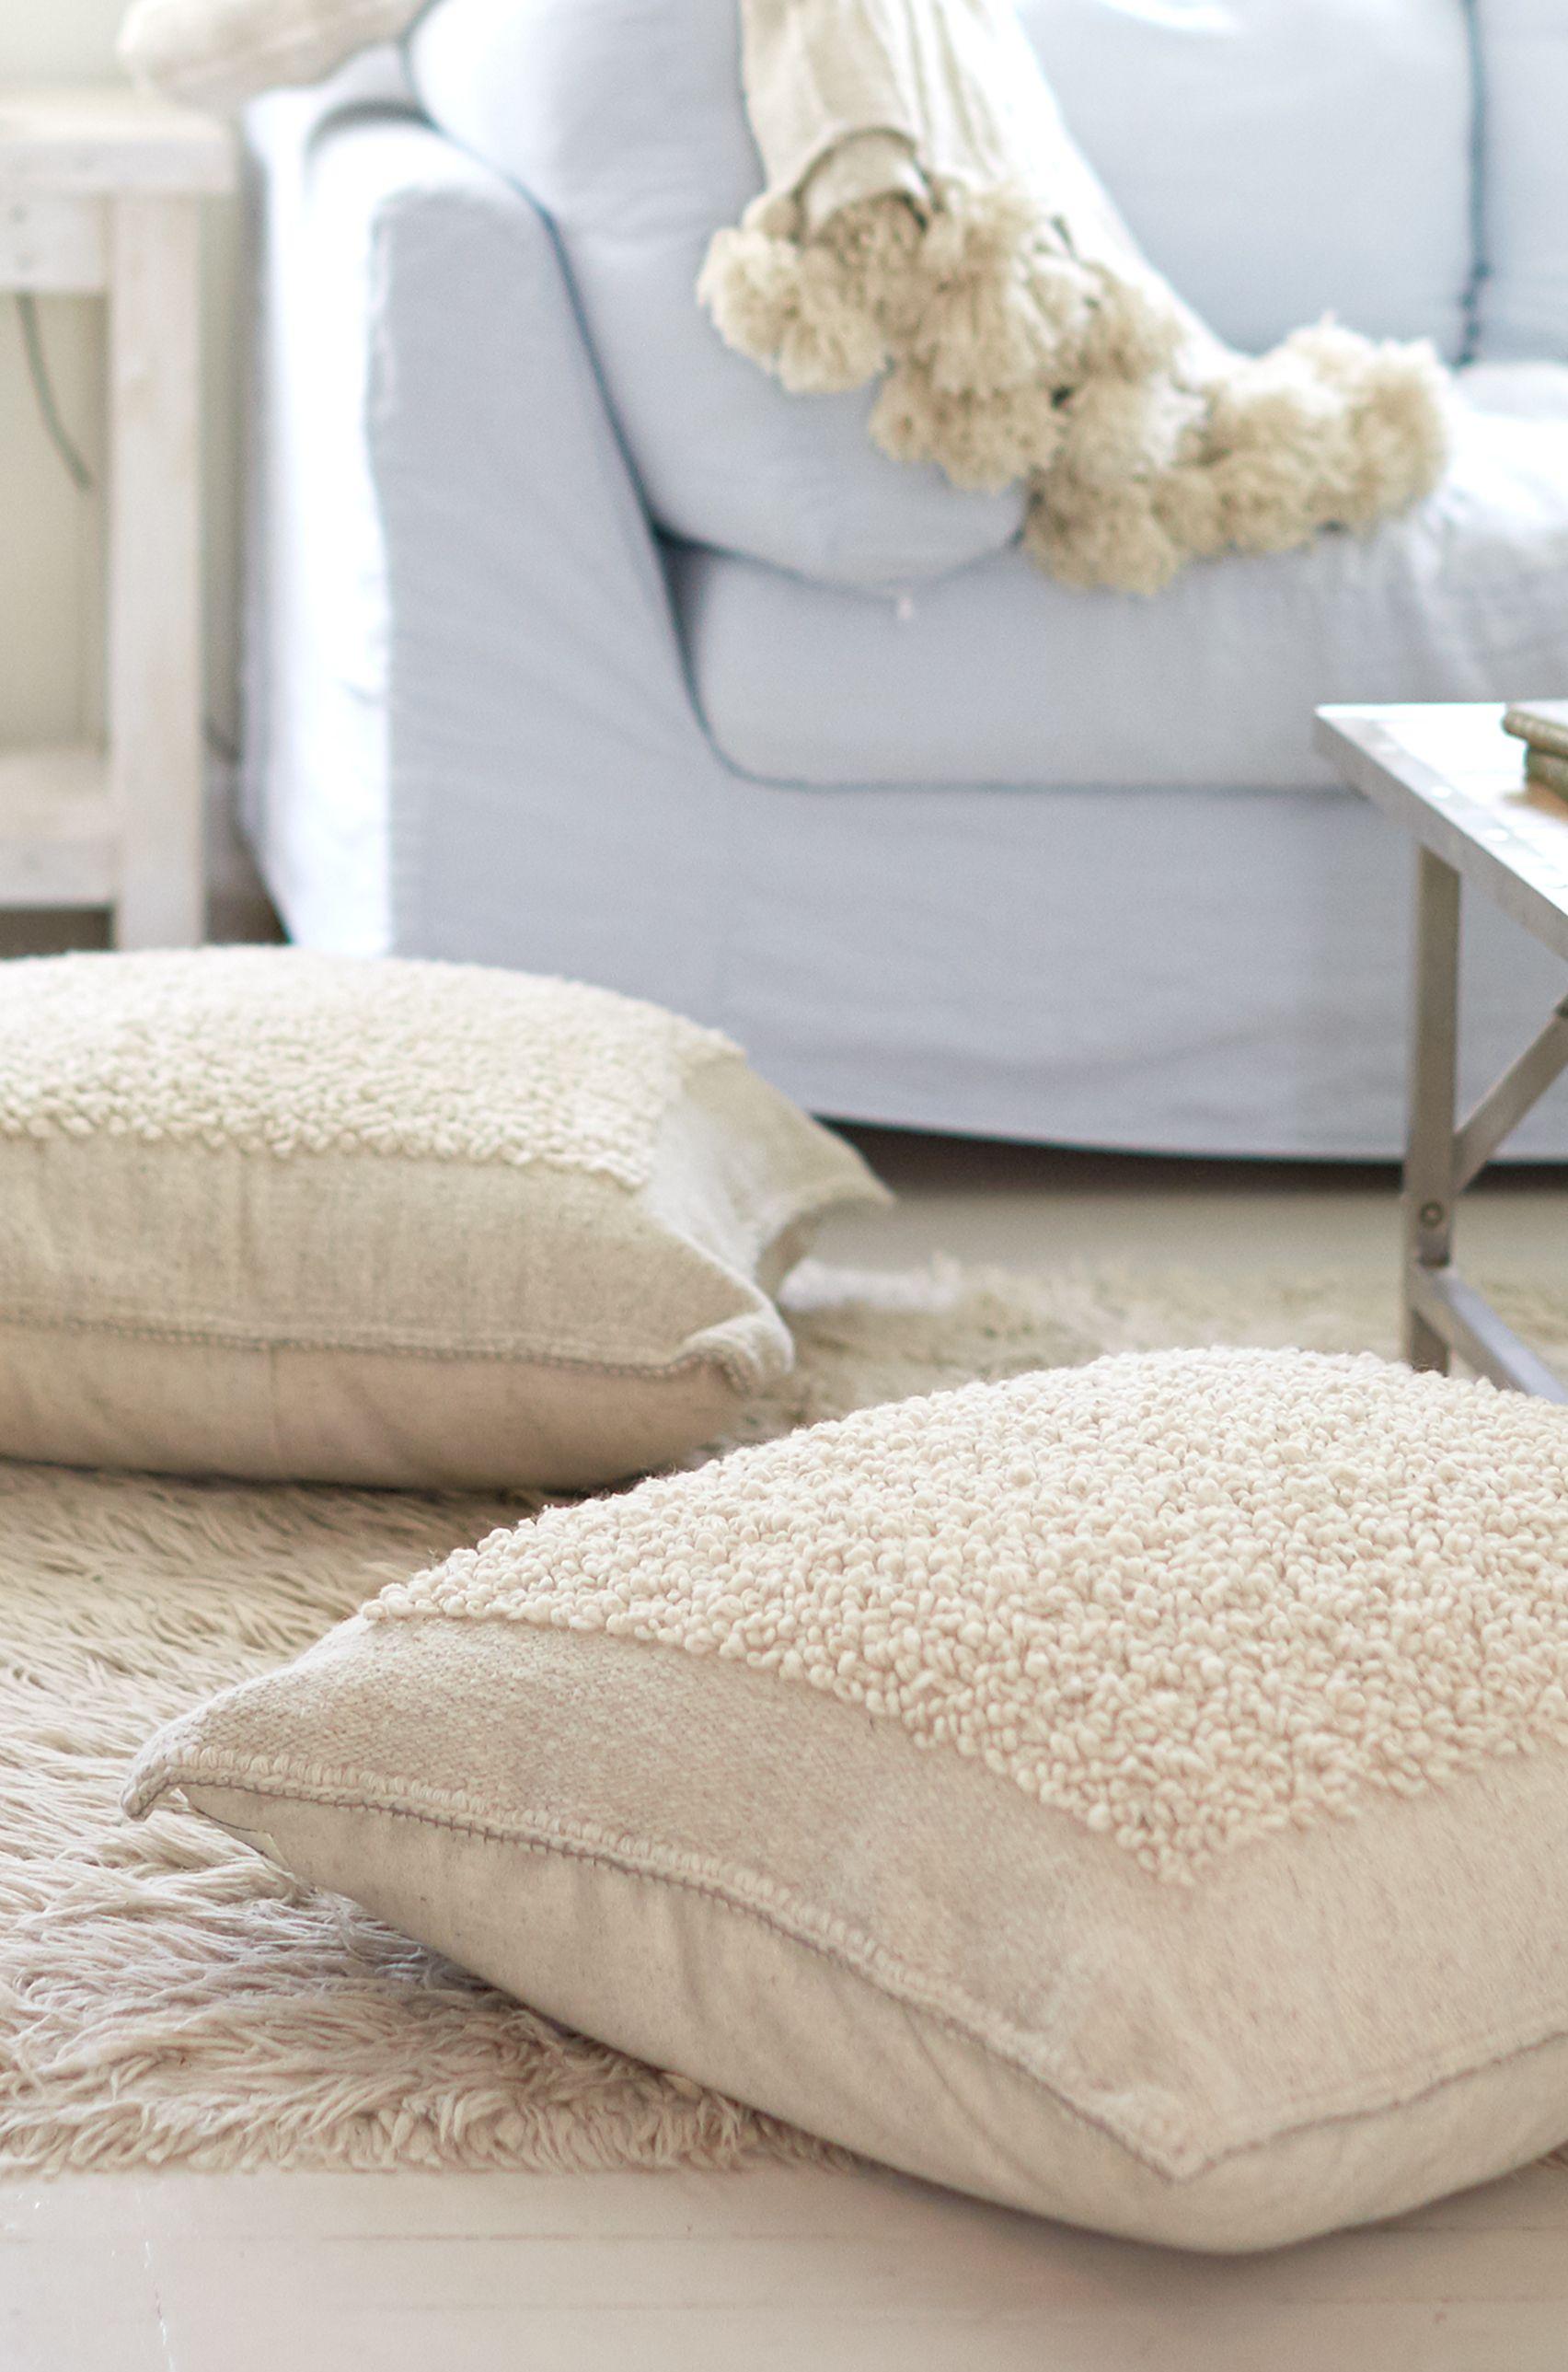 goods gallery blanket of design pillows brilliant decorative cushion throw pillow home ideas